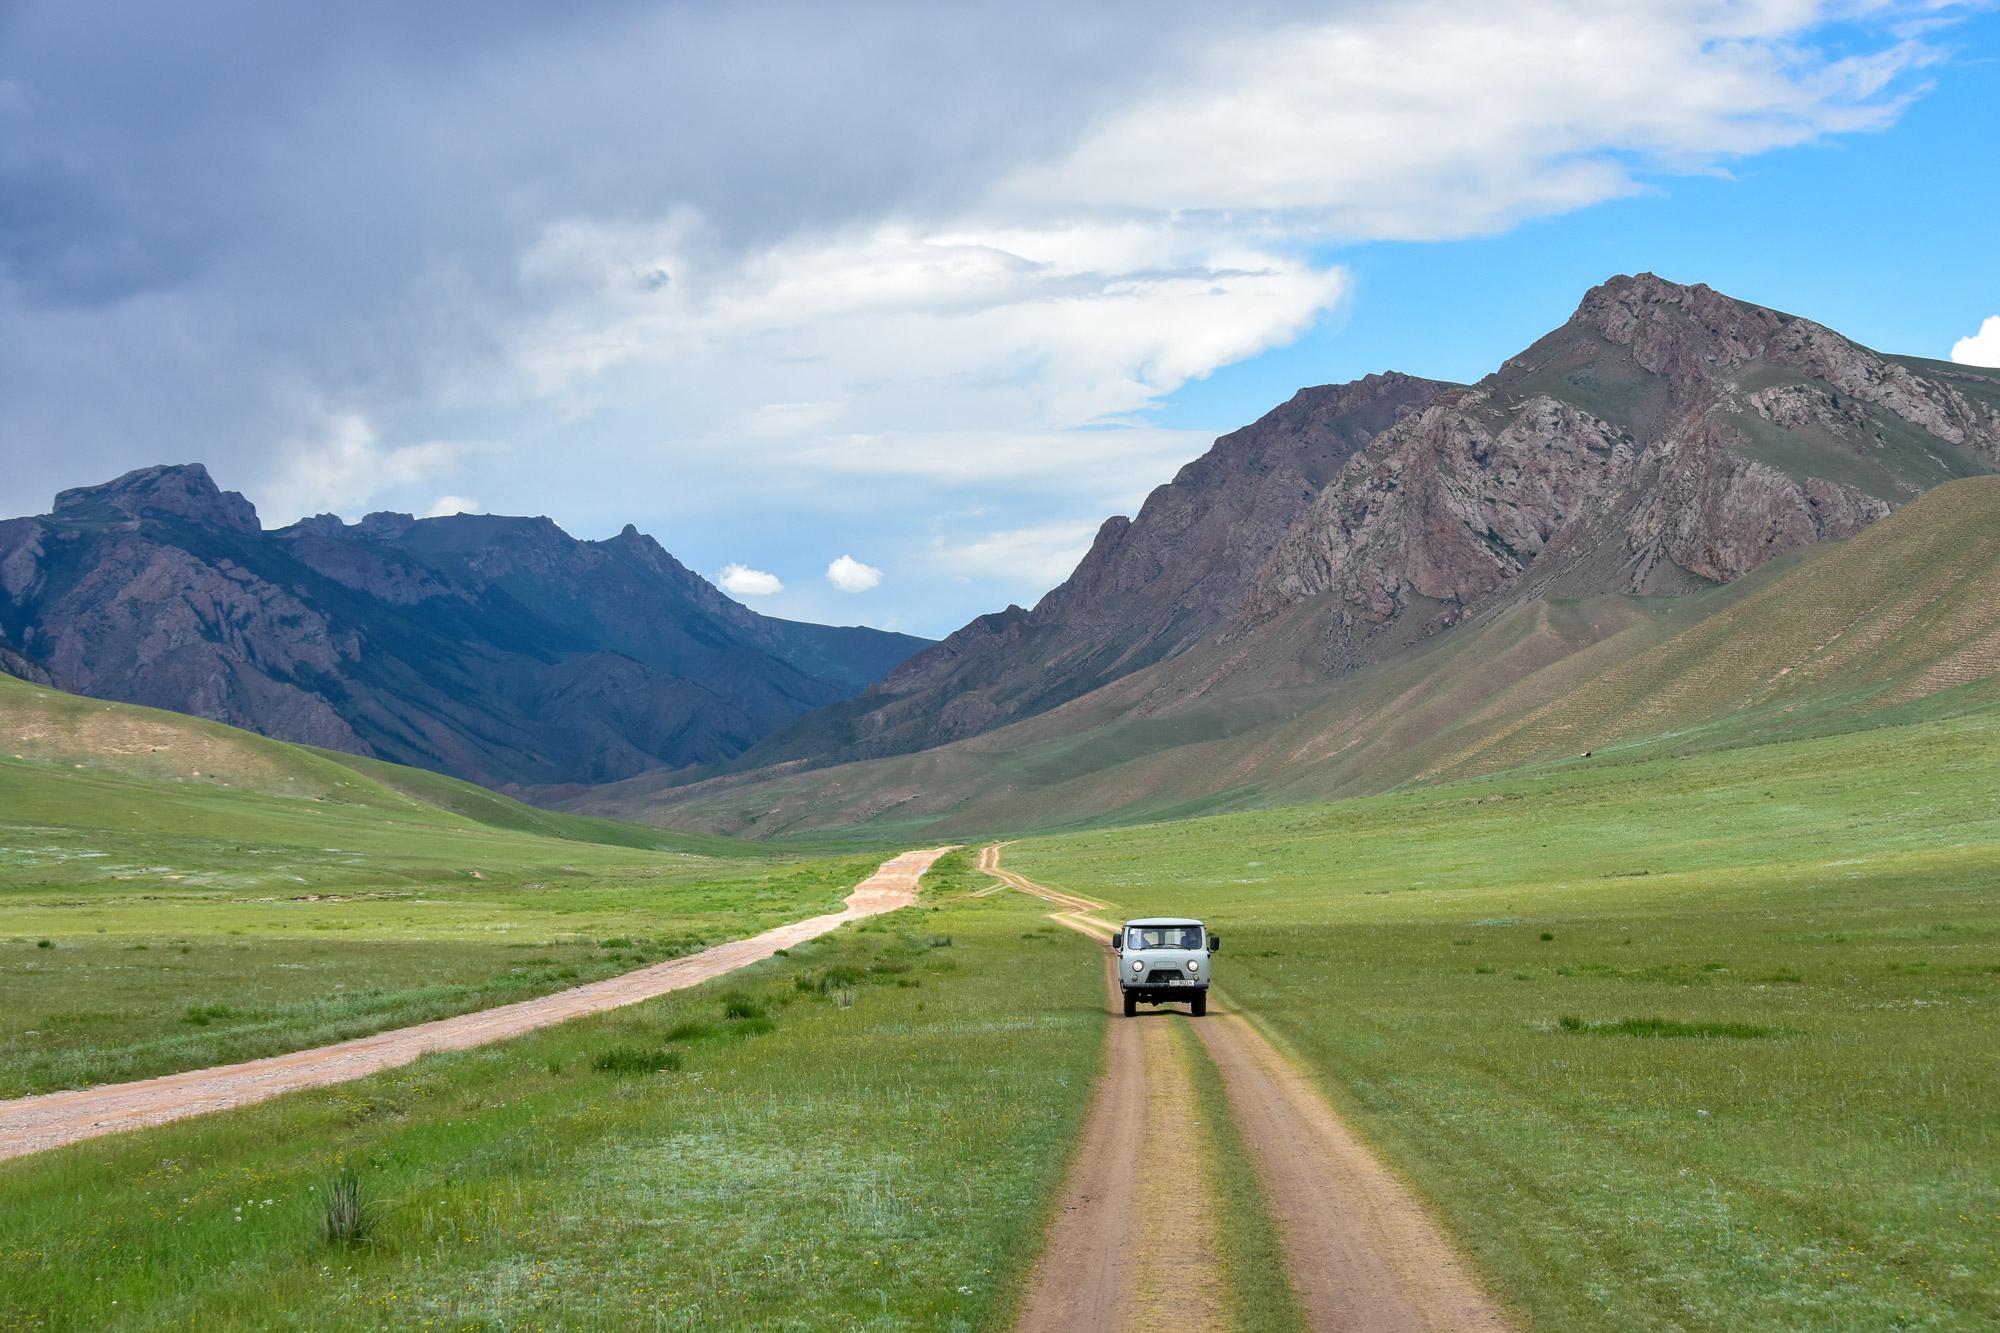 Reisroute Kirgizië - Naar Tash Rabat